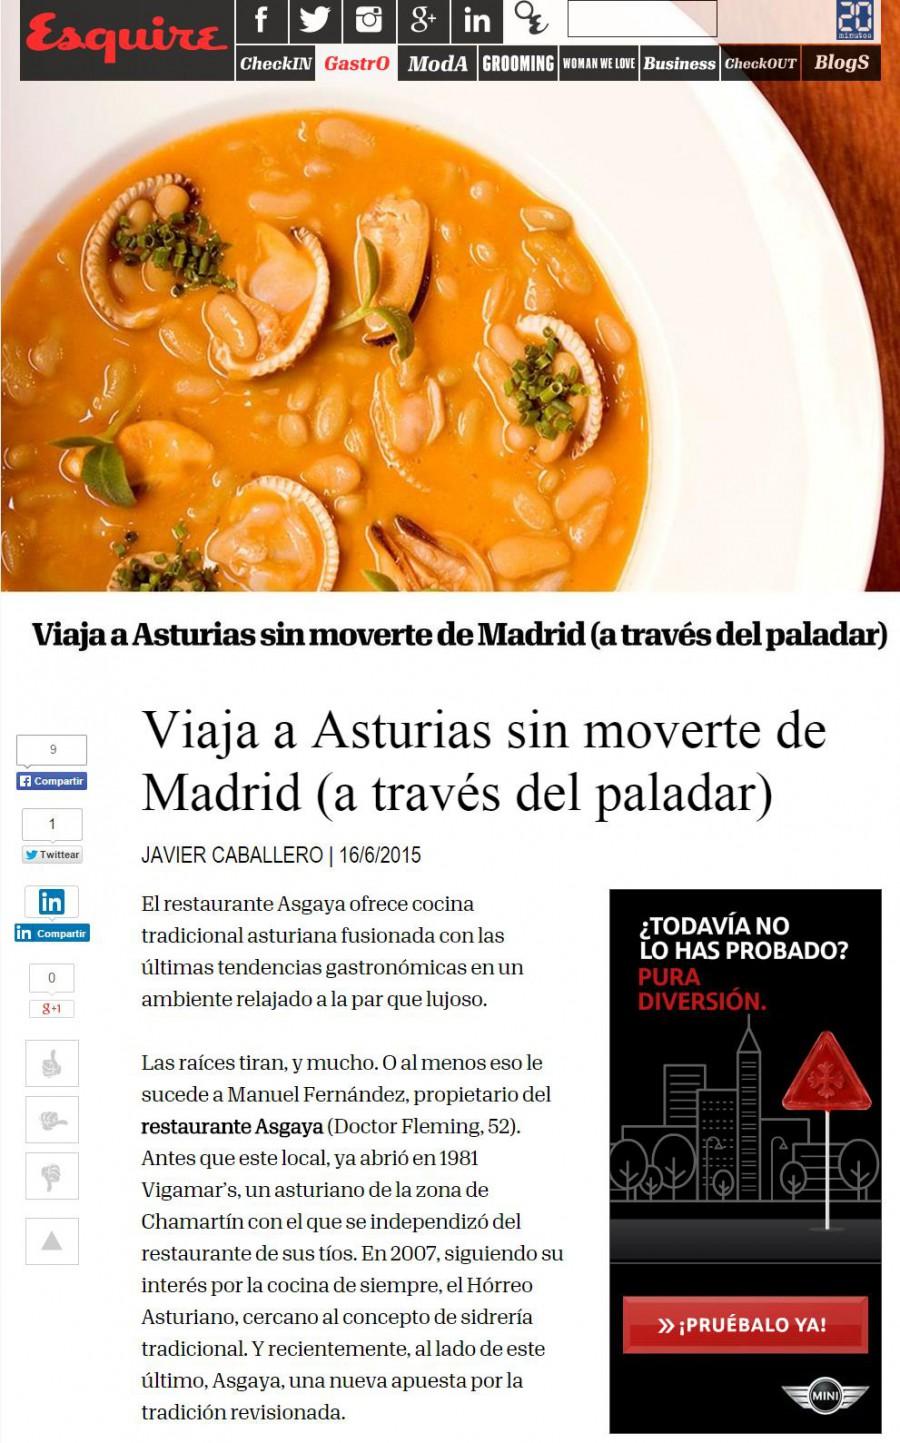 Esquire, viaje a Asturias sin moverte de Madrid